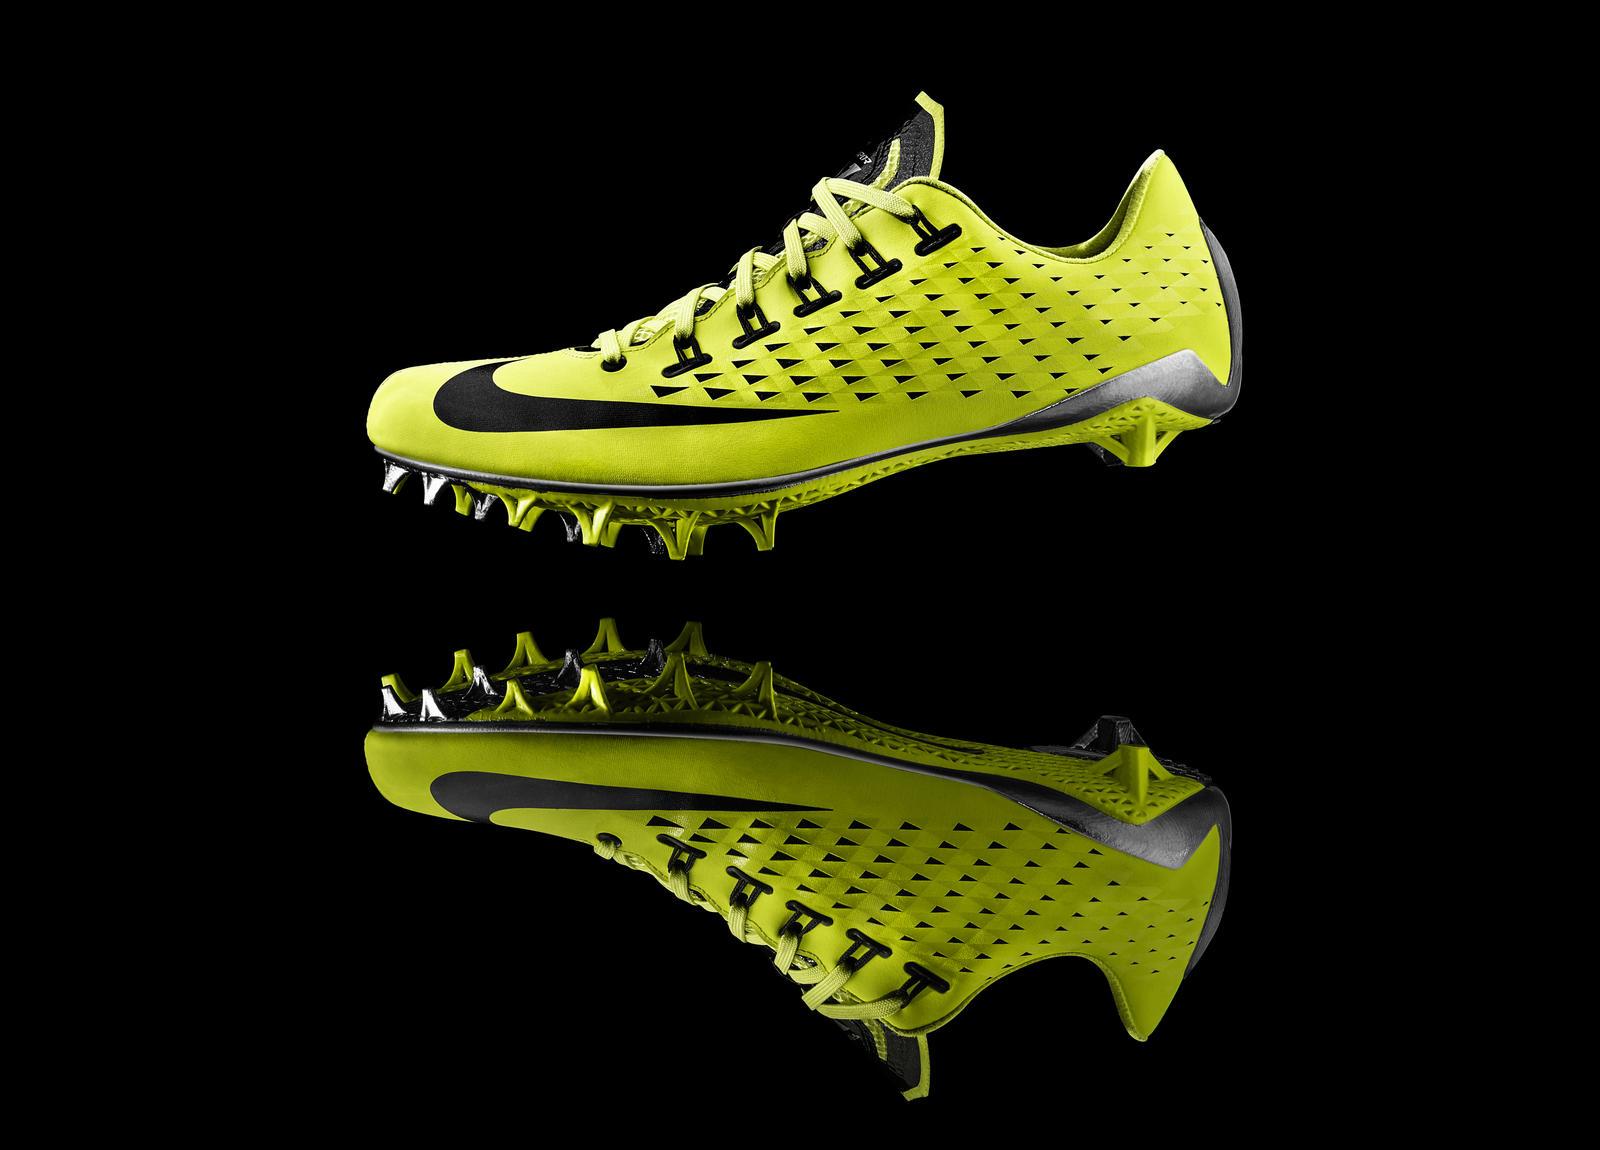 Nike Vapor Laser Talon [Source: Nike]